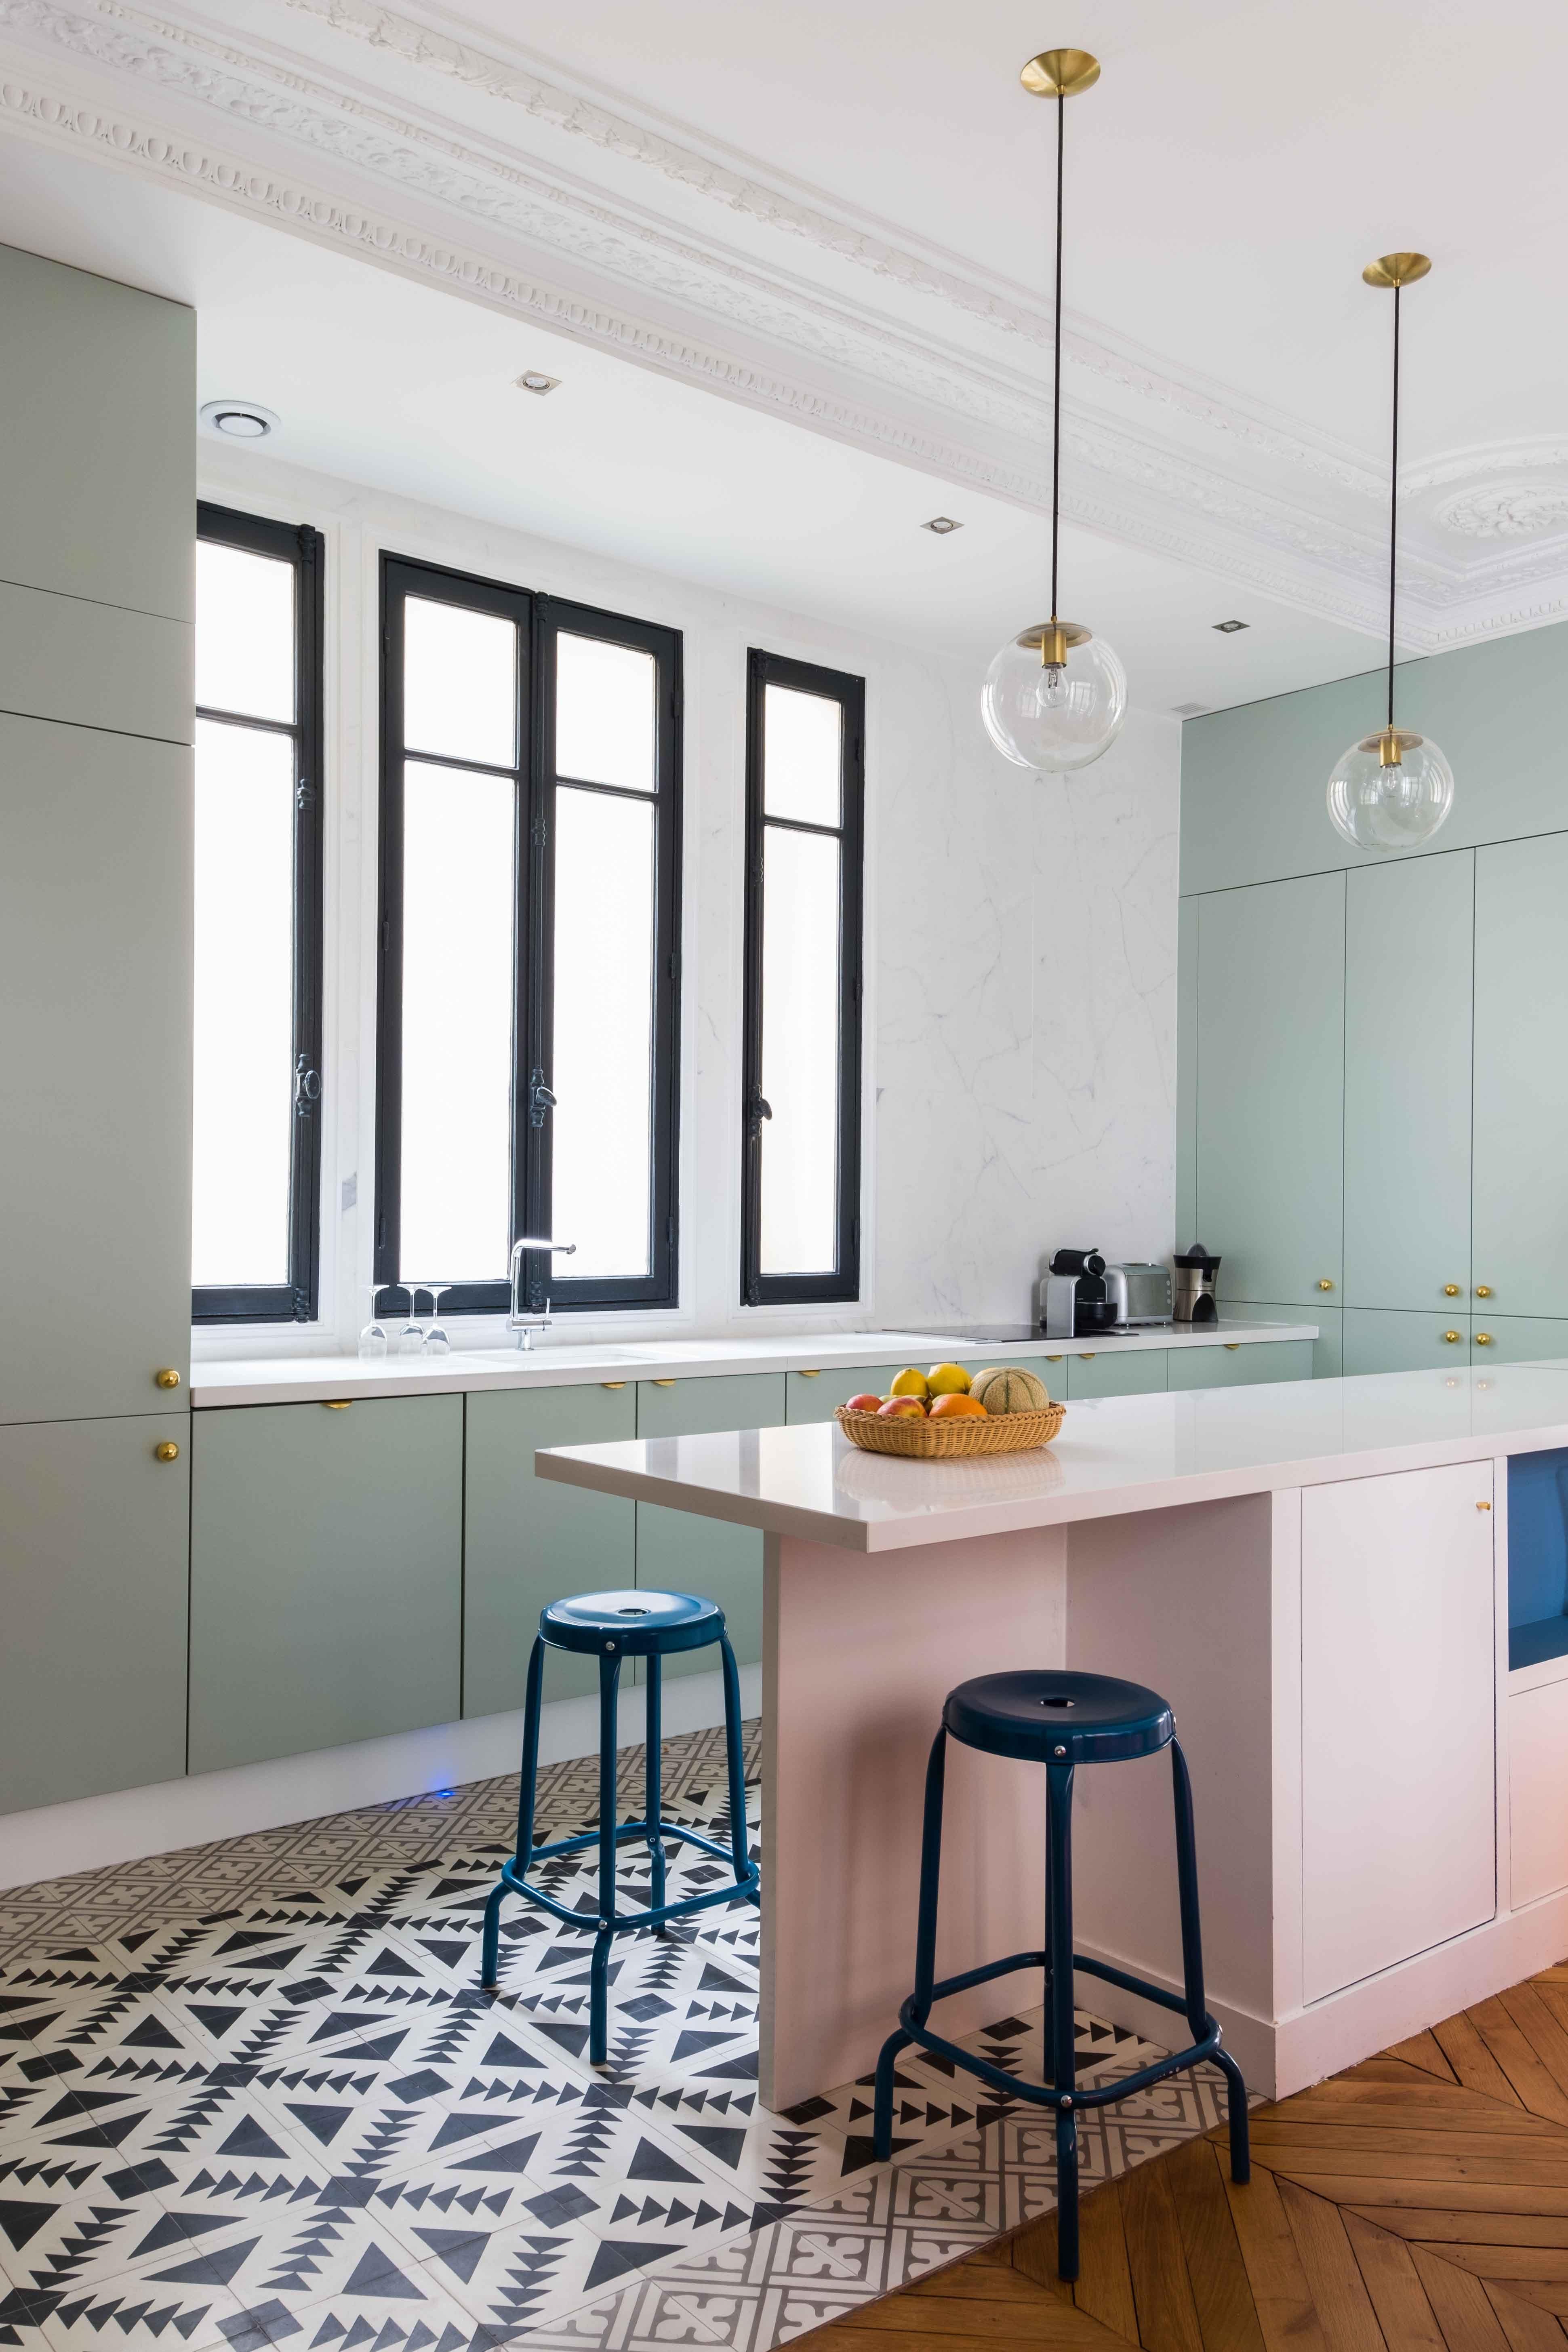 edouard fournier gcg architectes cuisines pinterest. Black Bedroom Furniture Sets. Home Design Ideas